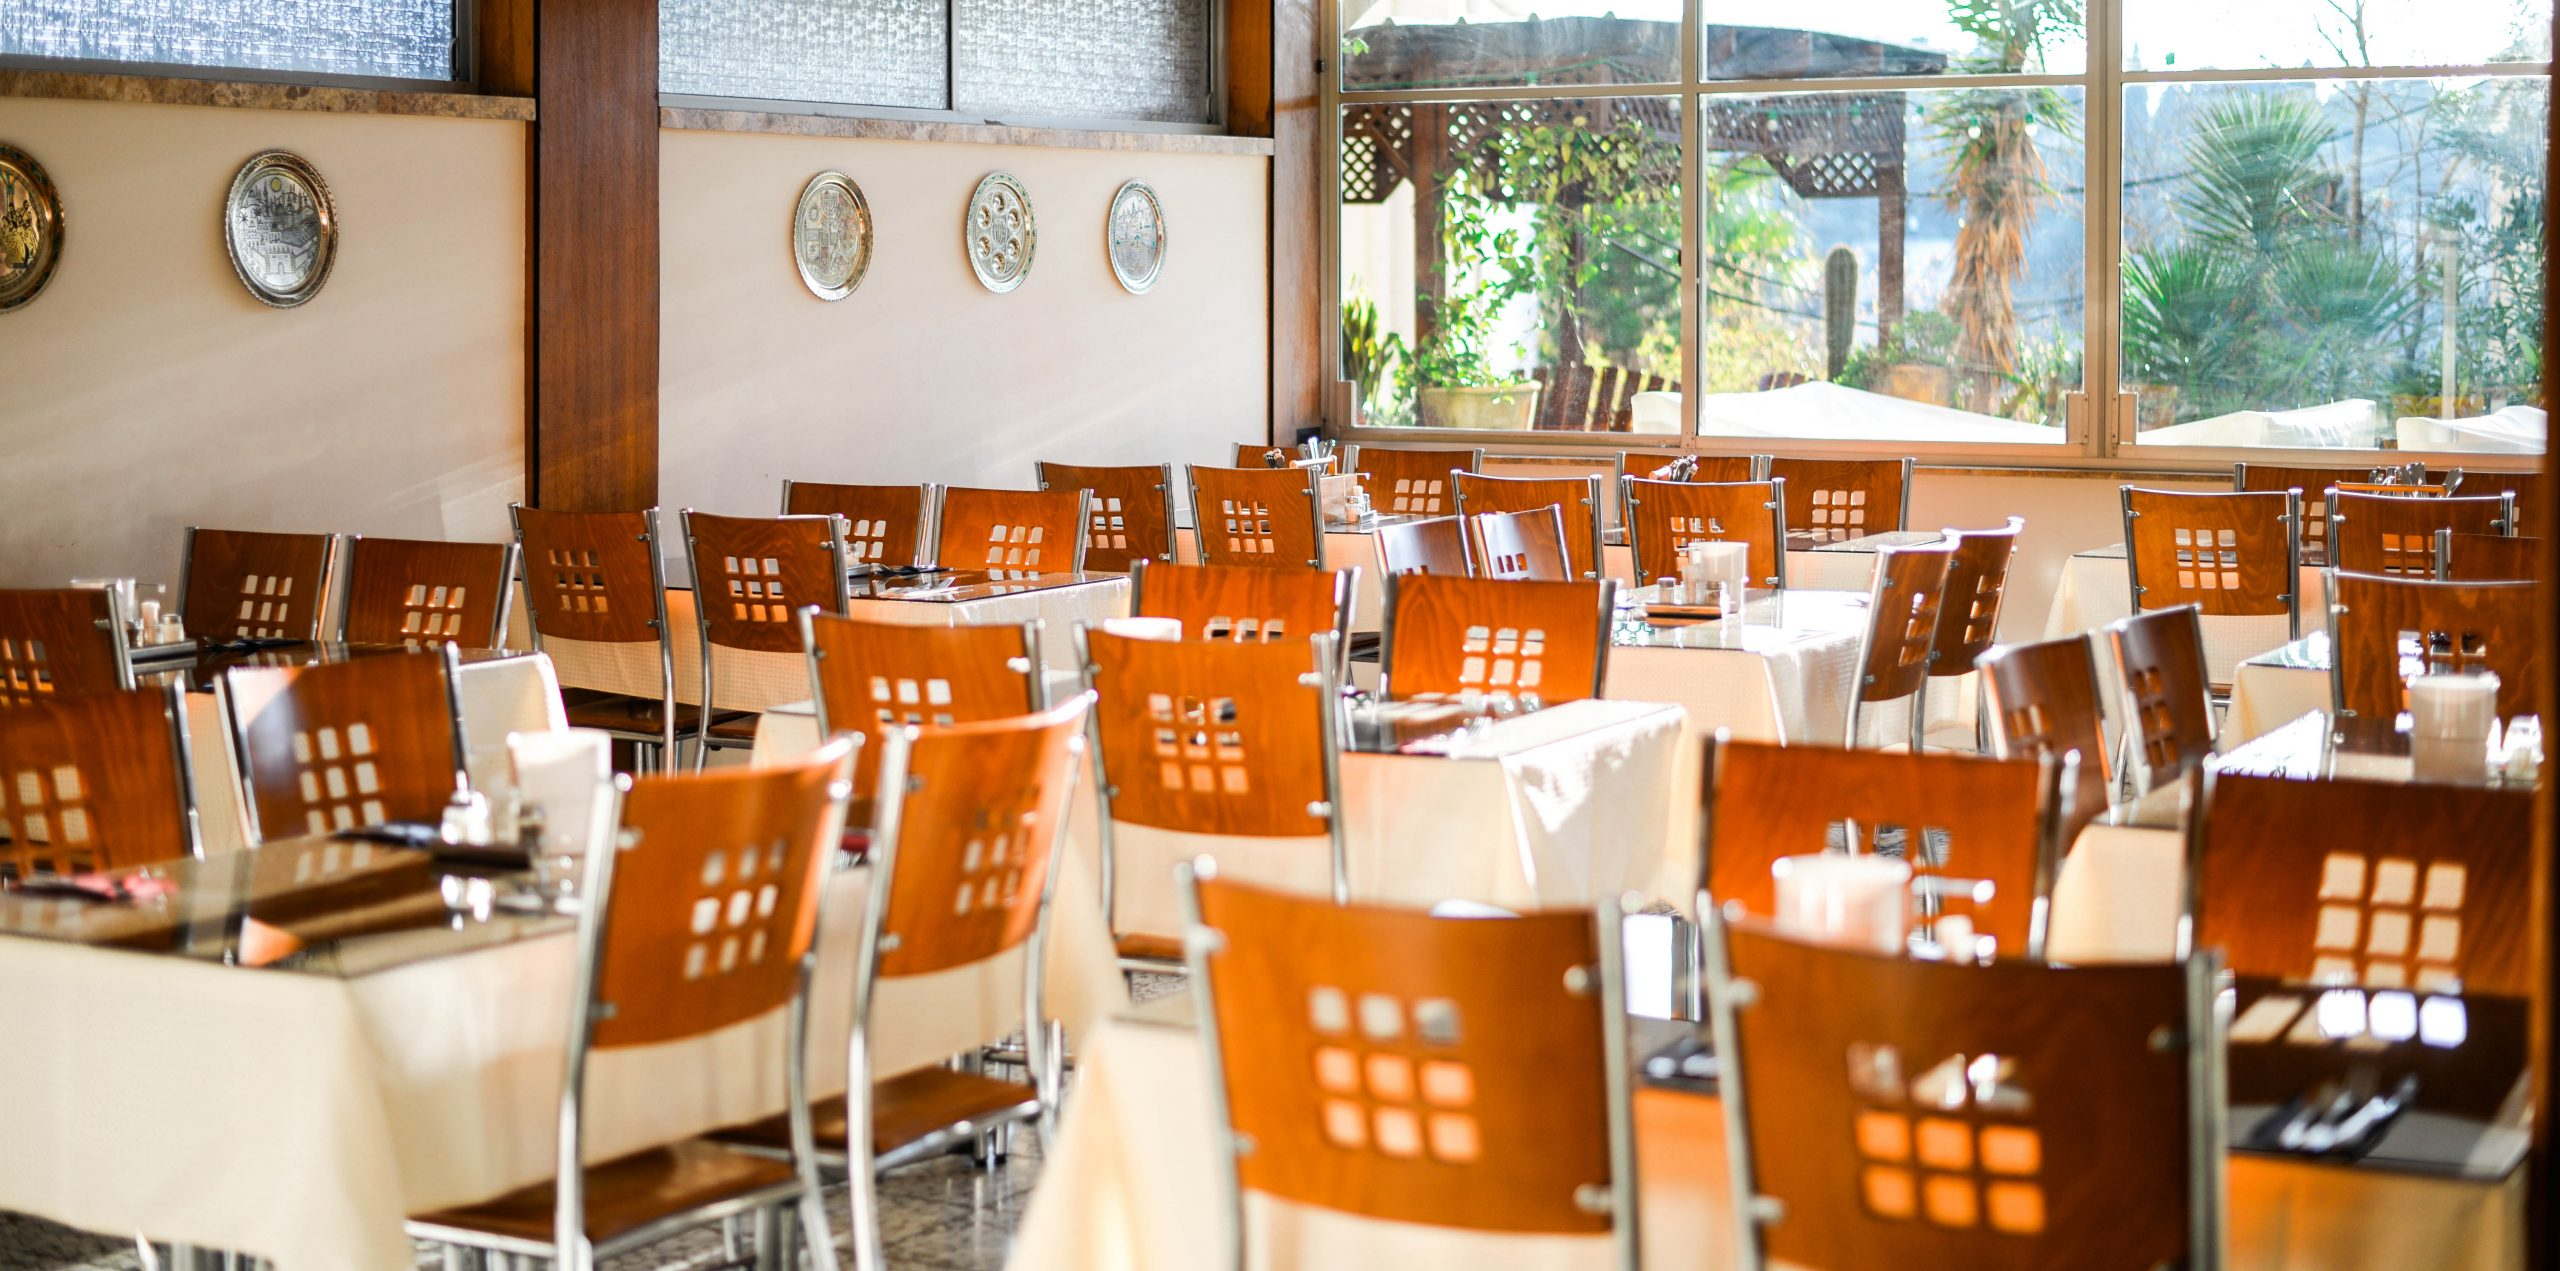 Beth-Shalom-Hotel-Haifa-bread-1-6 2